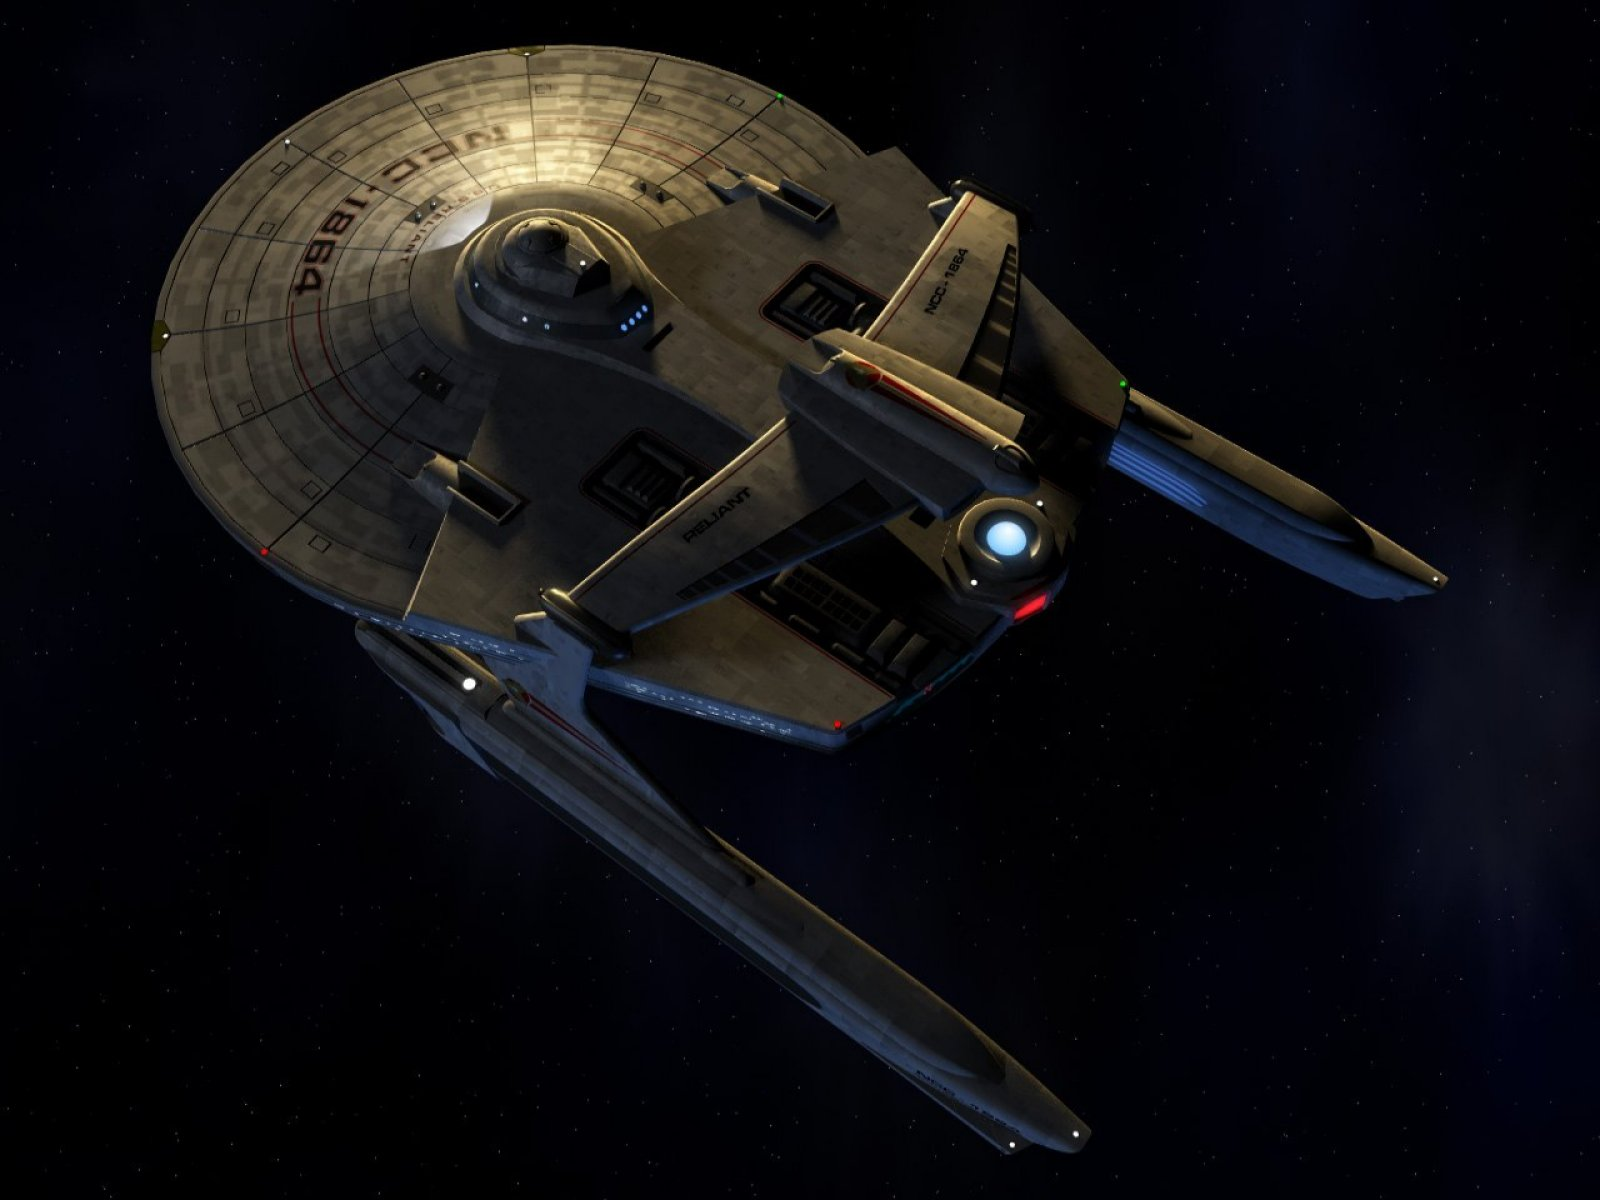 Star Trek starship USS Reliant NCC1864 computer desktop wallpaper 1600x1200